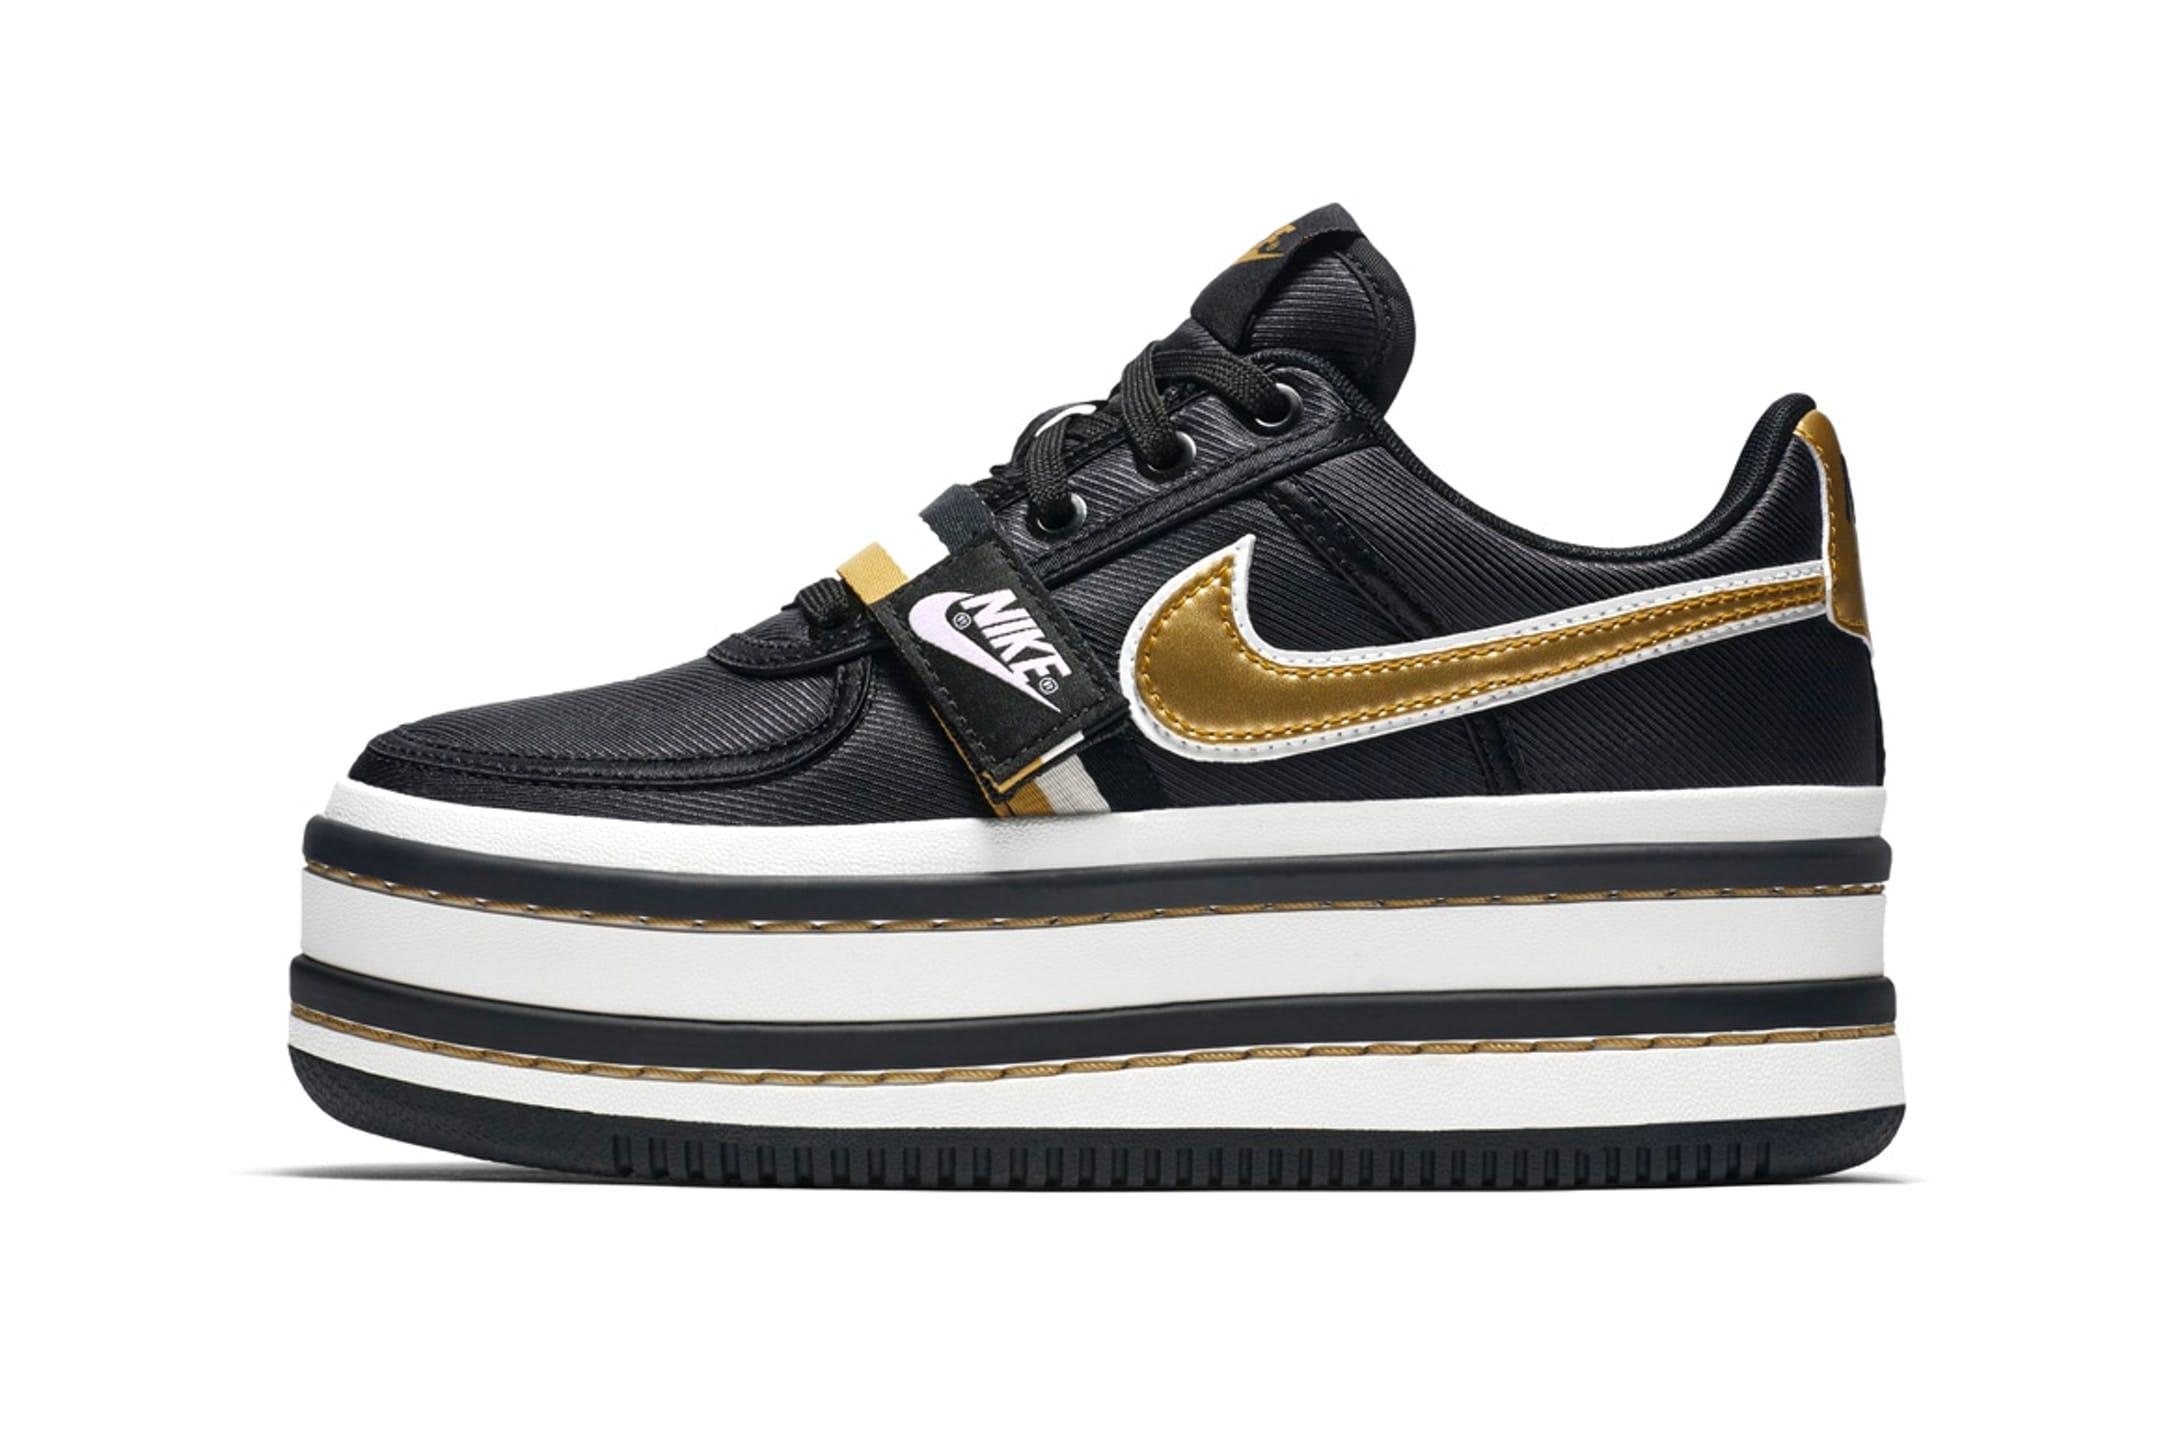 Nike's Vandal Surprise Platform in